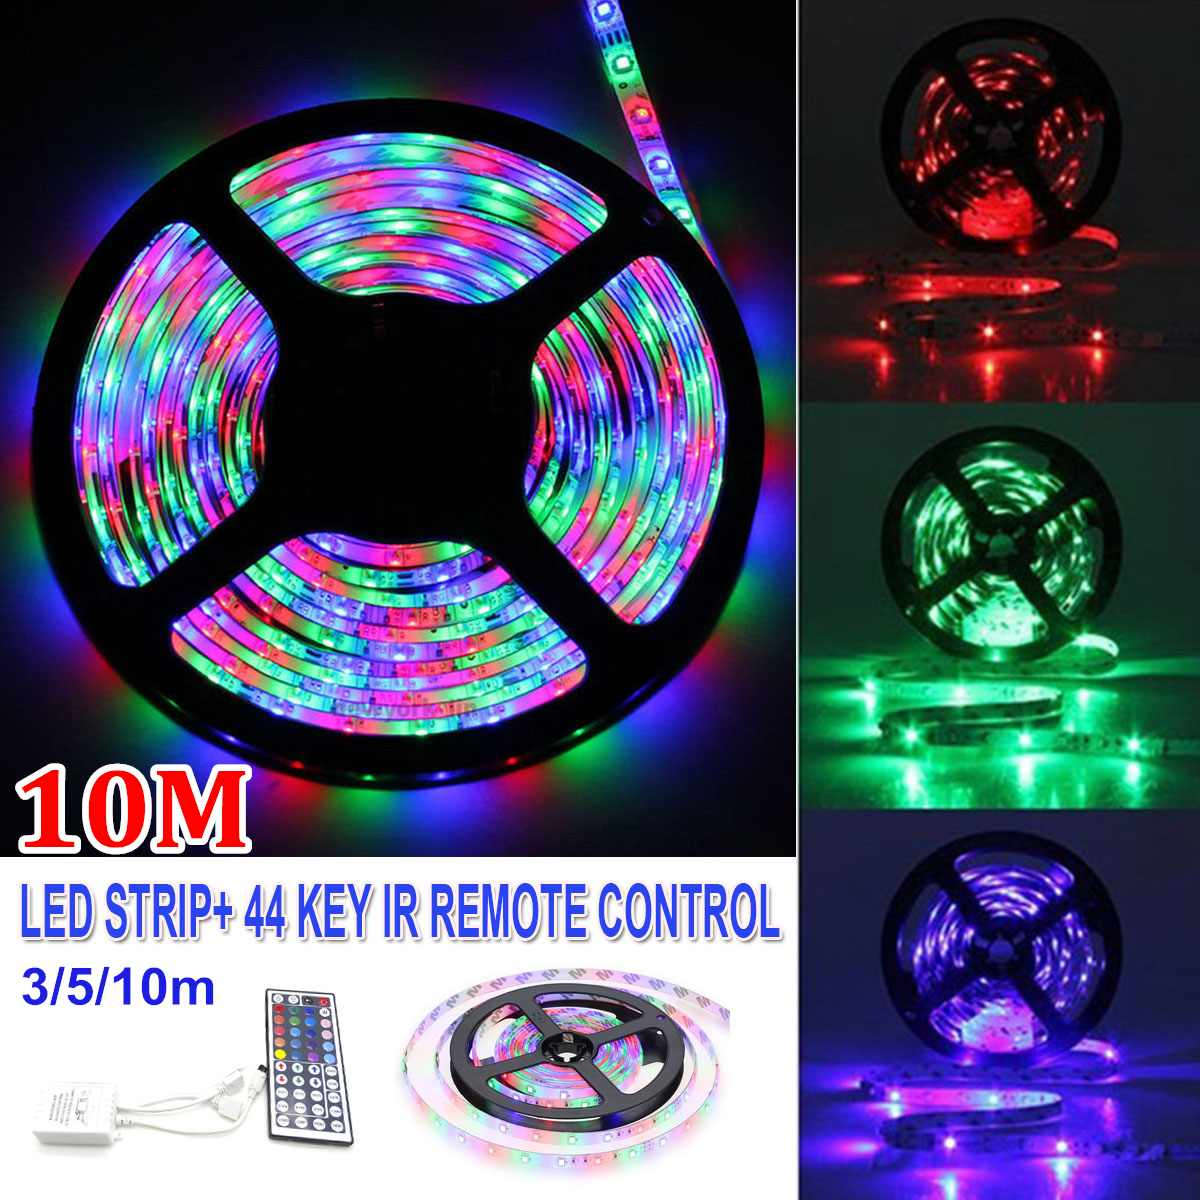 SMD3528 RGB 600 LED Strip 3/5/10M 12V Light String Tape + 44 Key IR Remote Control Non-waterproof 60 LED/M LED Ribbon Tape